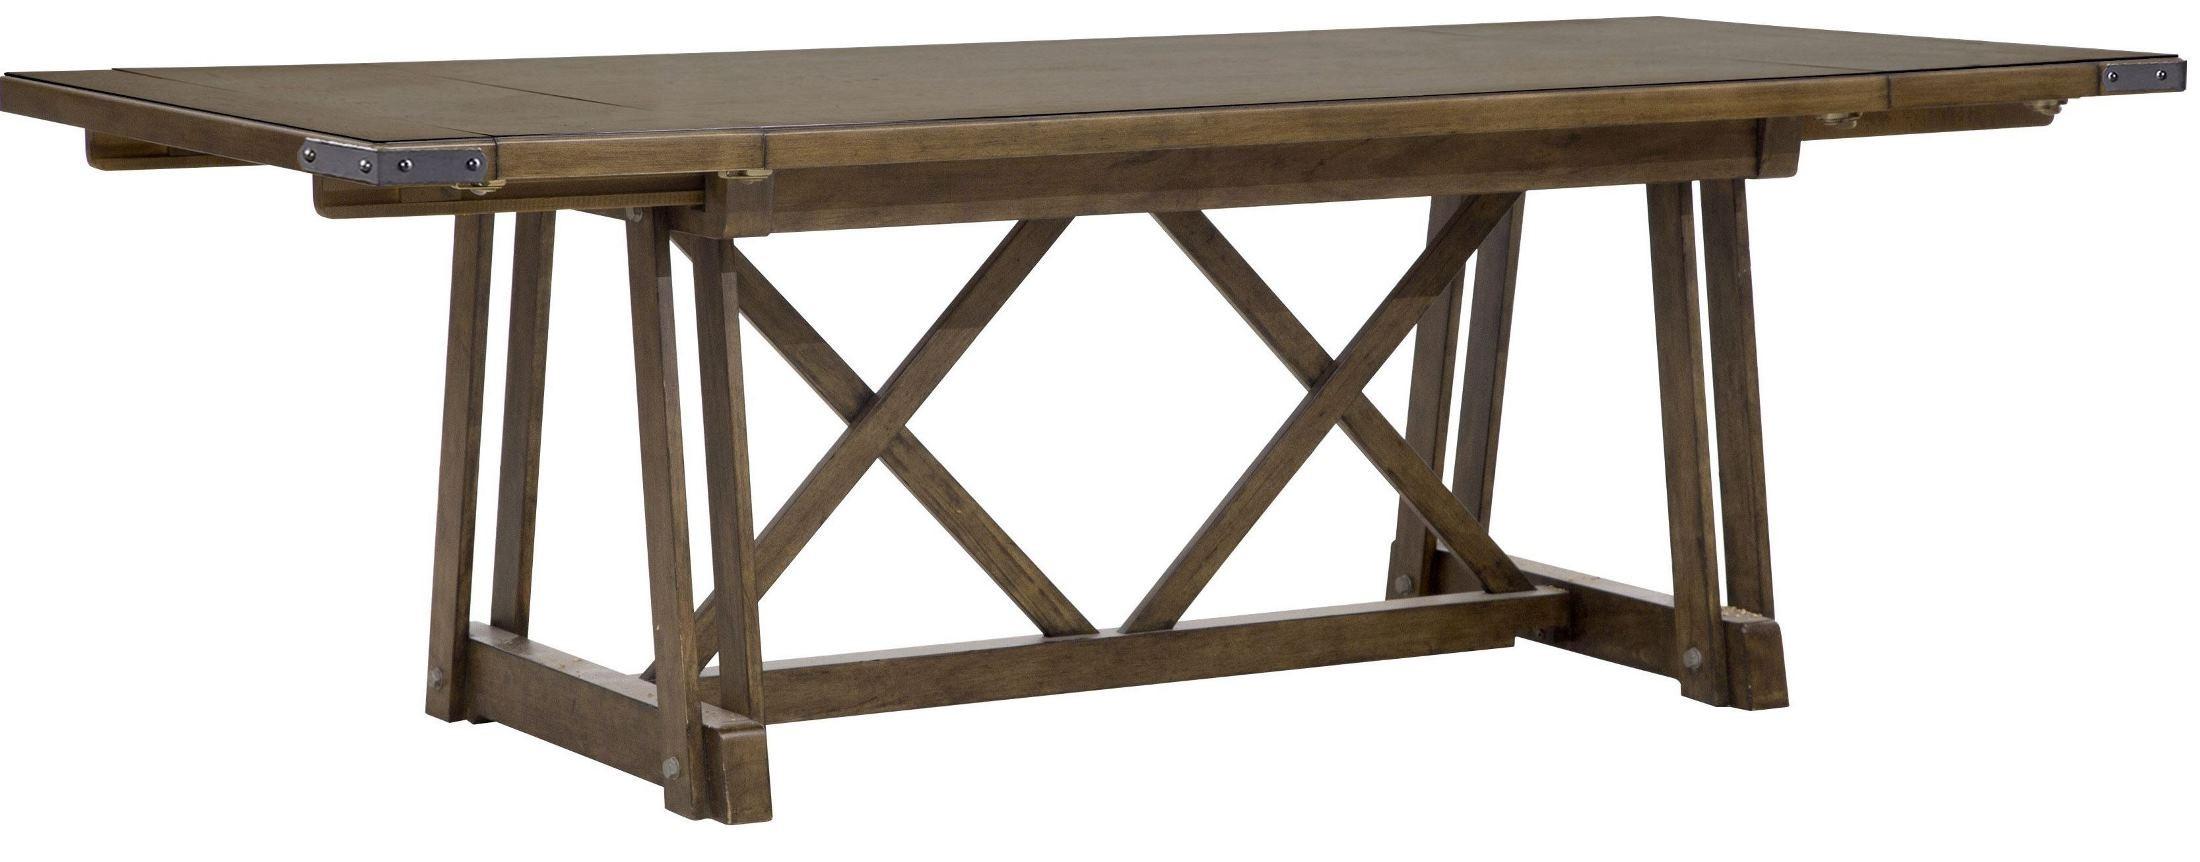 Weston Loft Rectangular Dining Table from Pulaski P001240  : p001240241 s2cc from colemanfurniture.com size 2200 x 862 jpeg 181kB